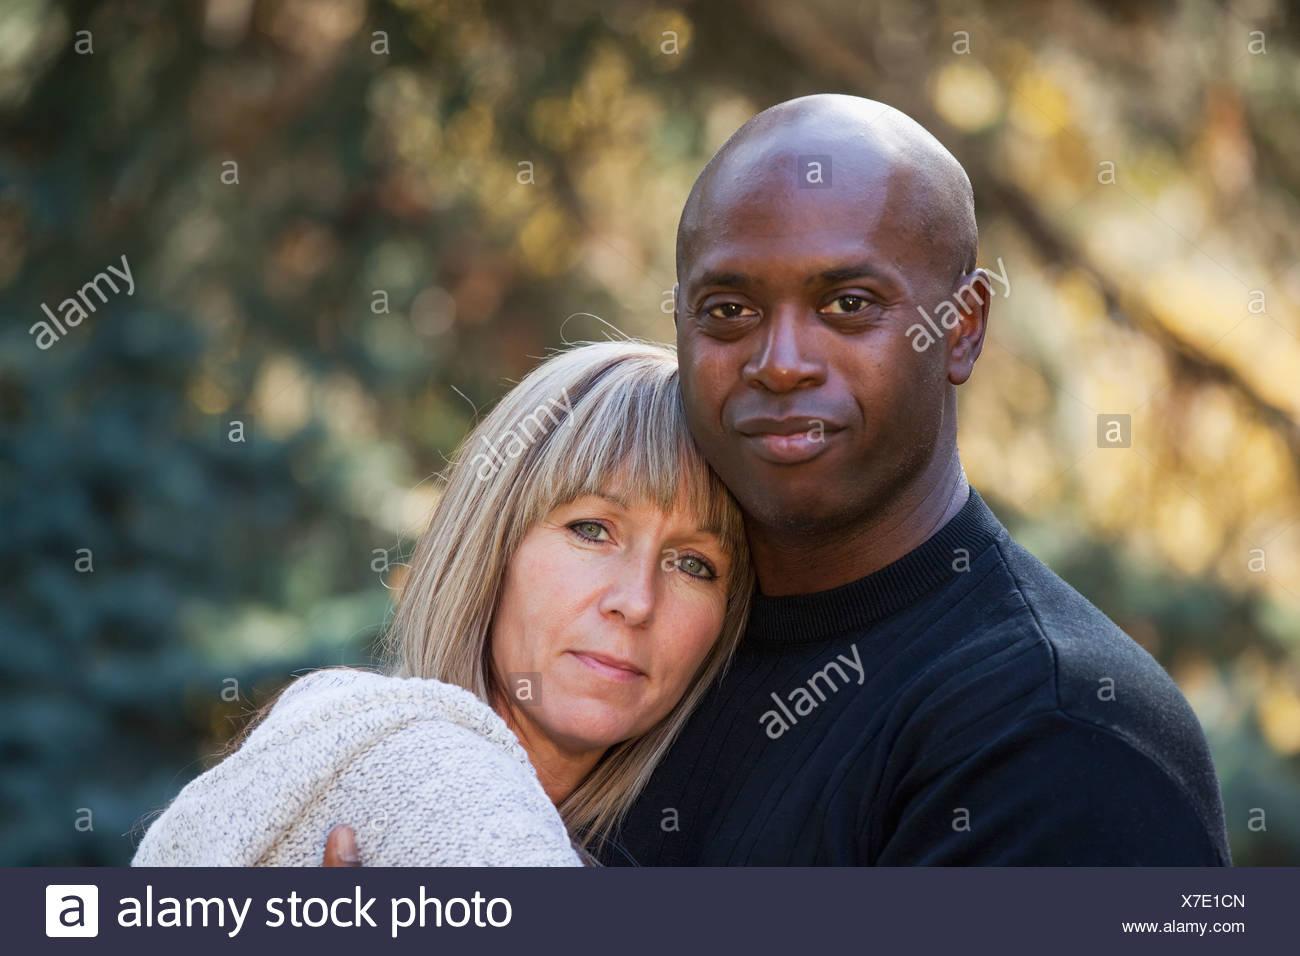 interracial kanada randevú a bádogon